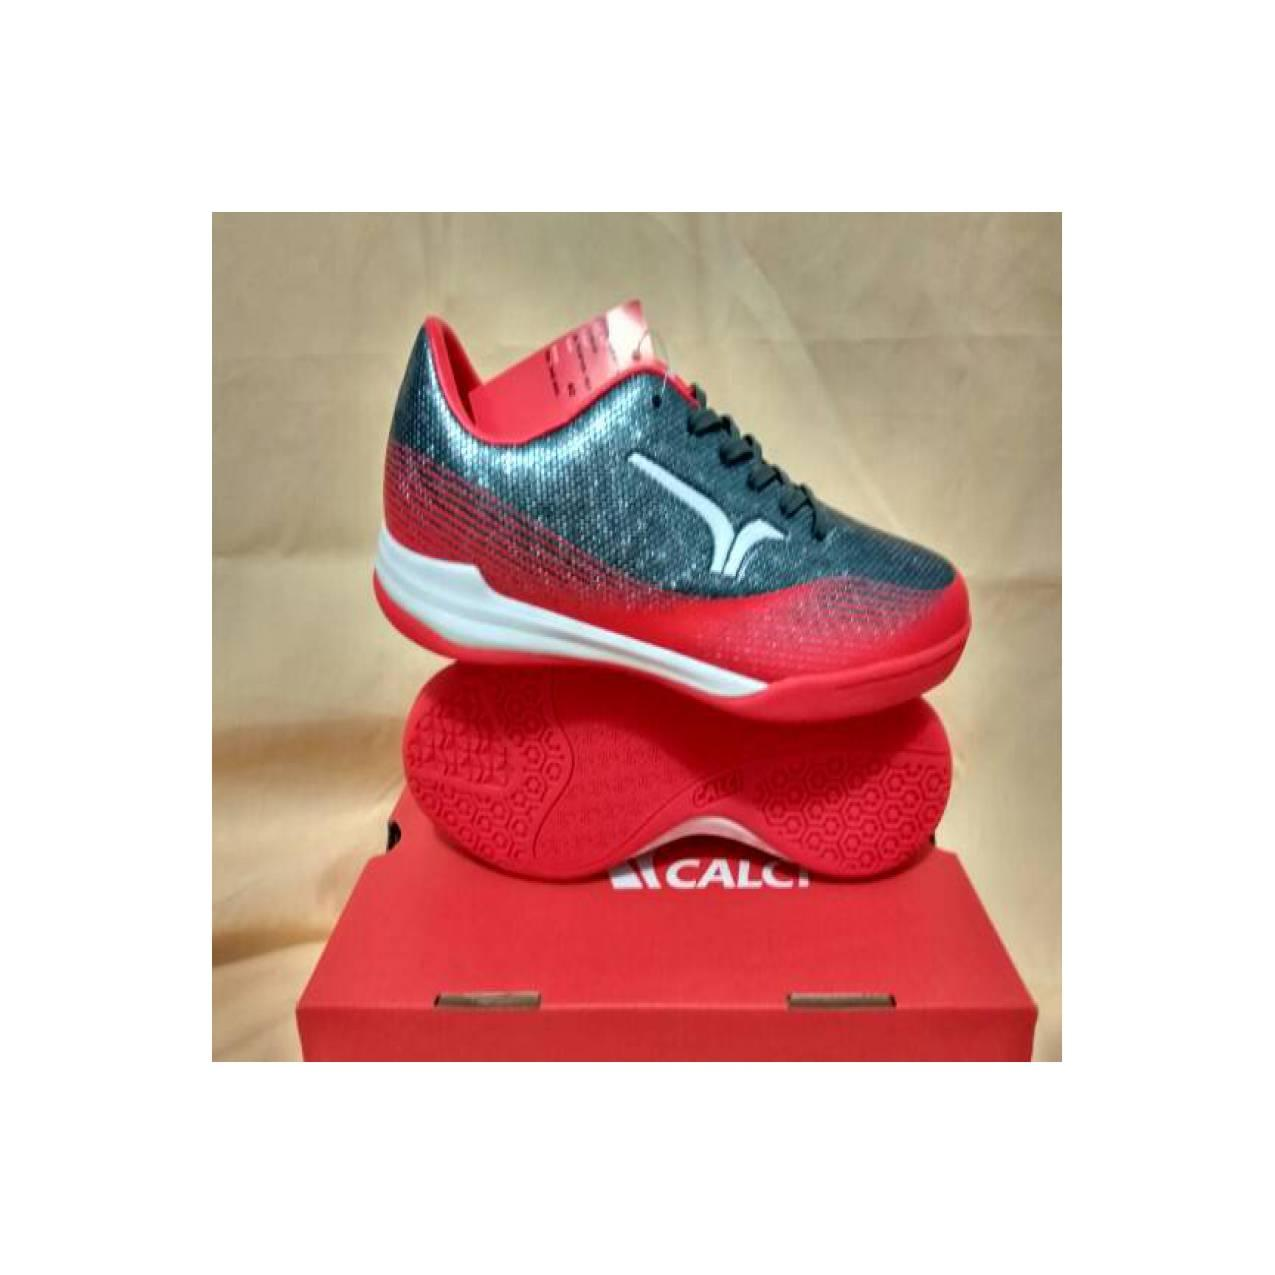 Sepatu Futsal Calci Conquest Futsal Metalic Pewter